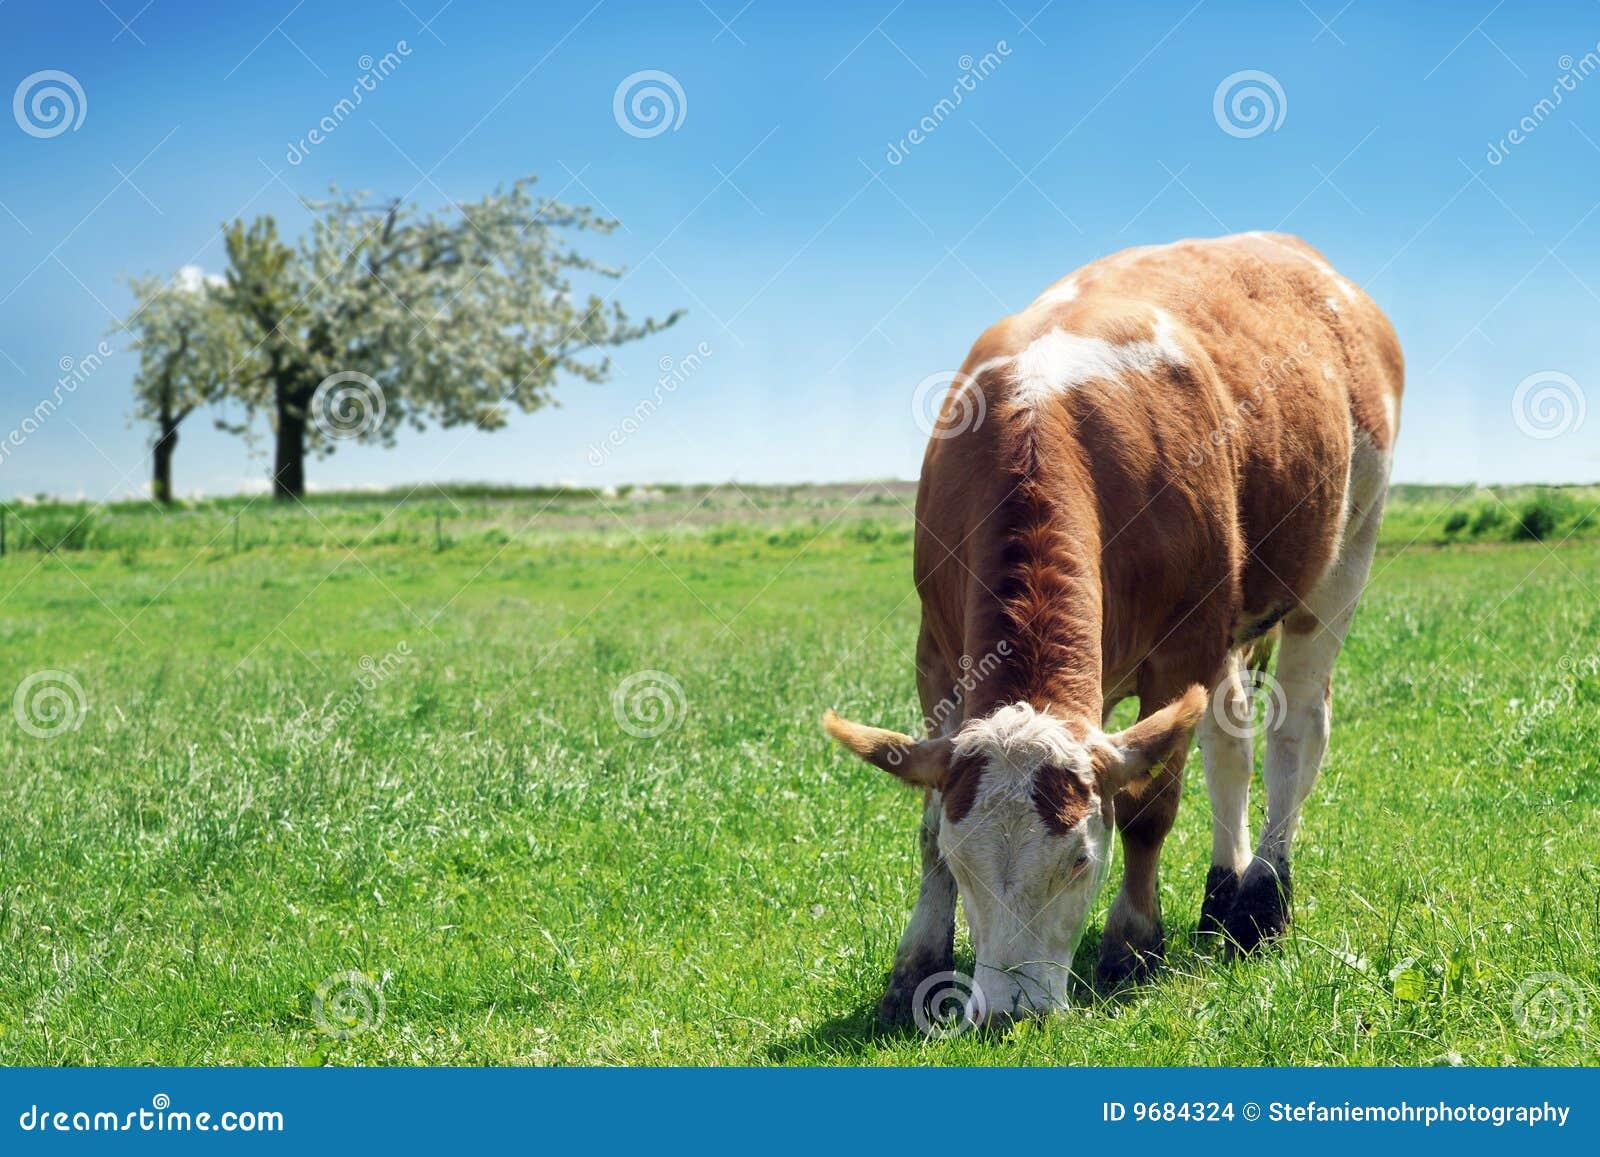 Big Cow Udders Milk  Hot Girl Hd Wallpaper-8604